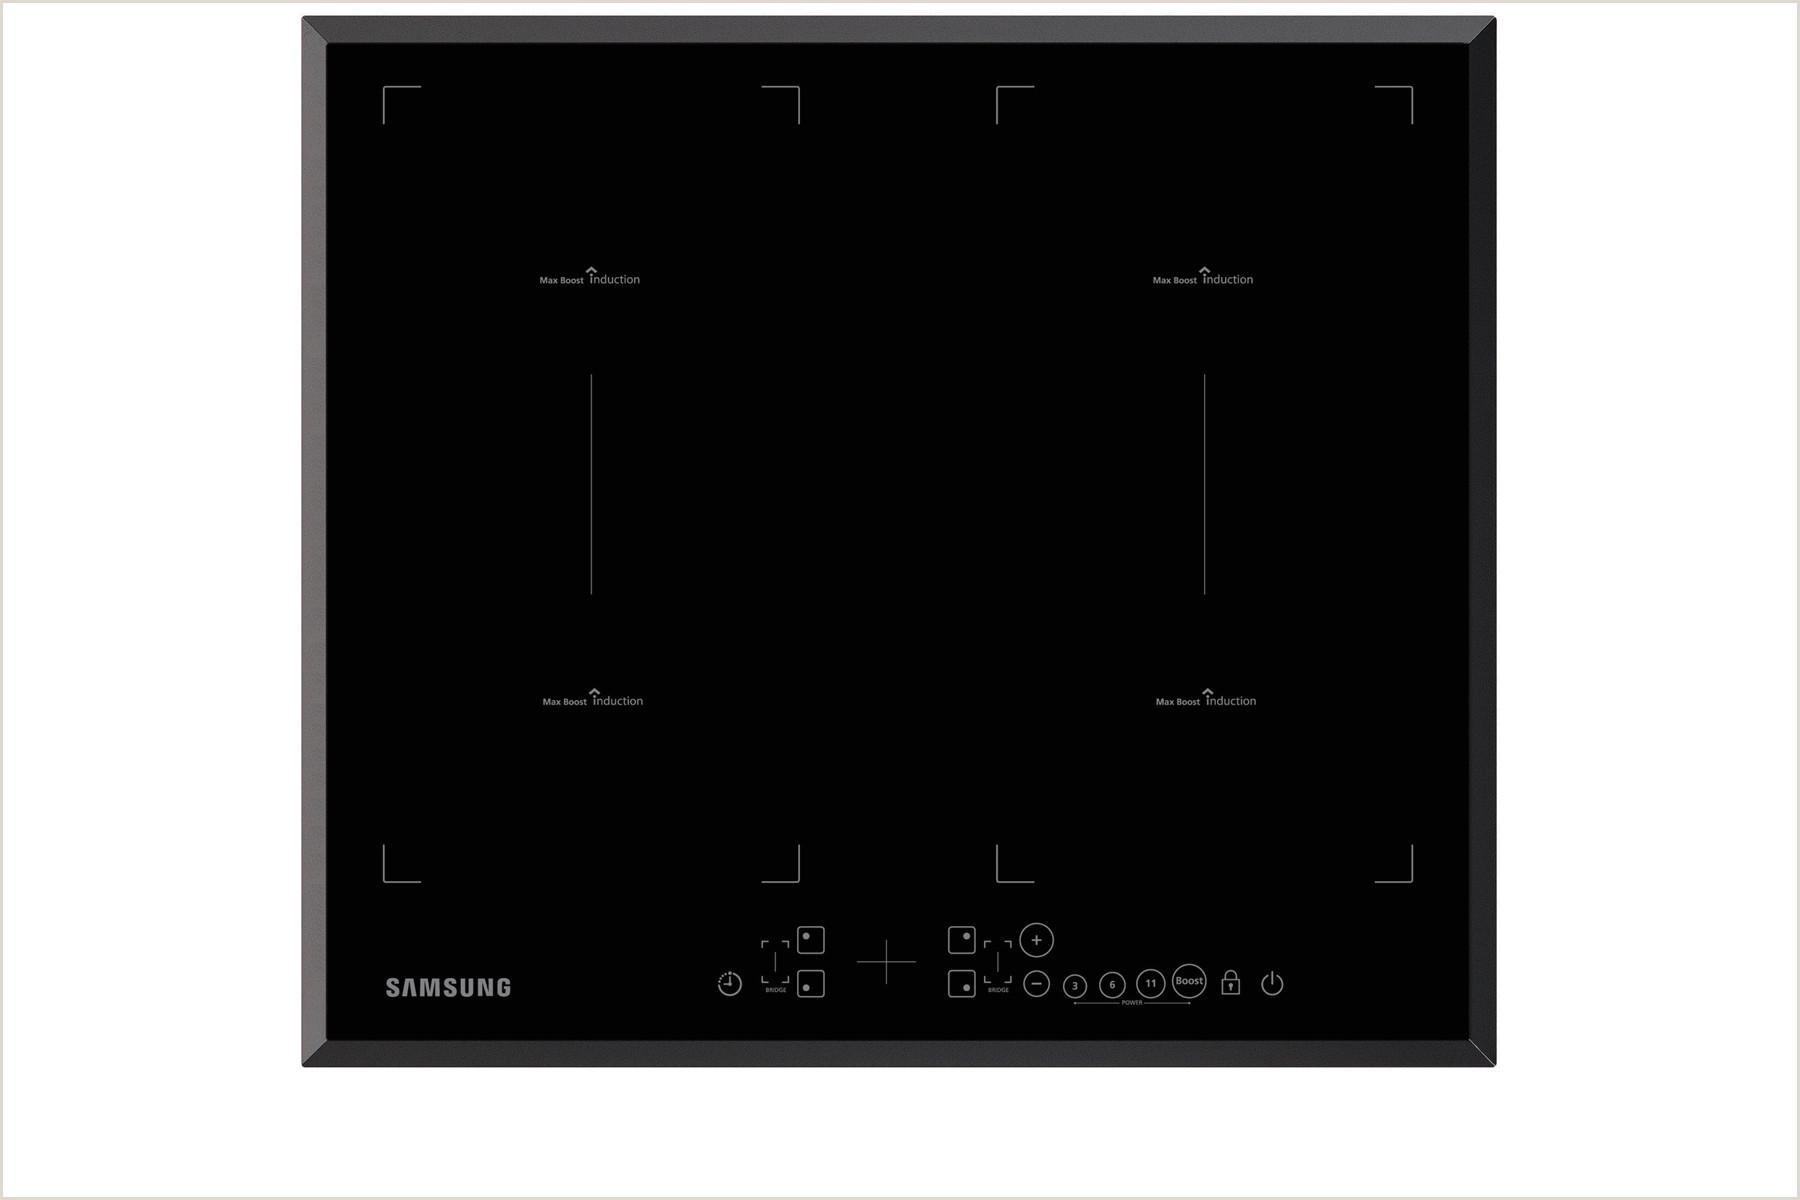 Hoja De Vida formato Unico Imprimir Samsung Electroménager Plaque De Cuisson Table Induction 2